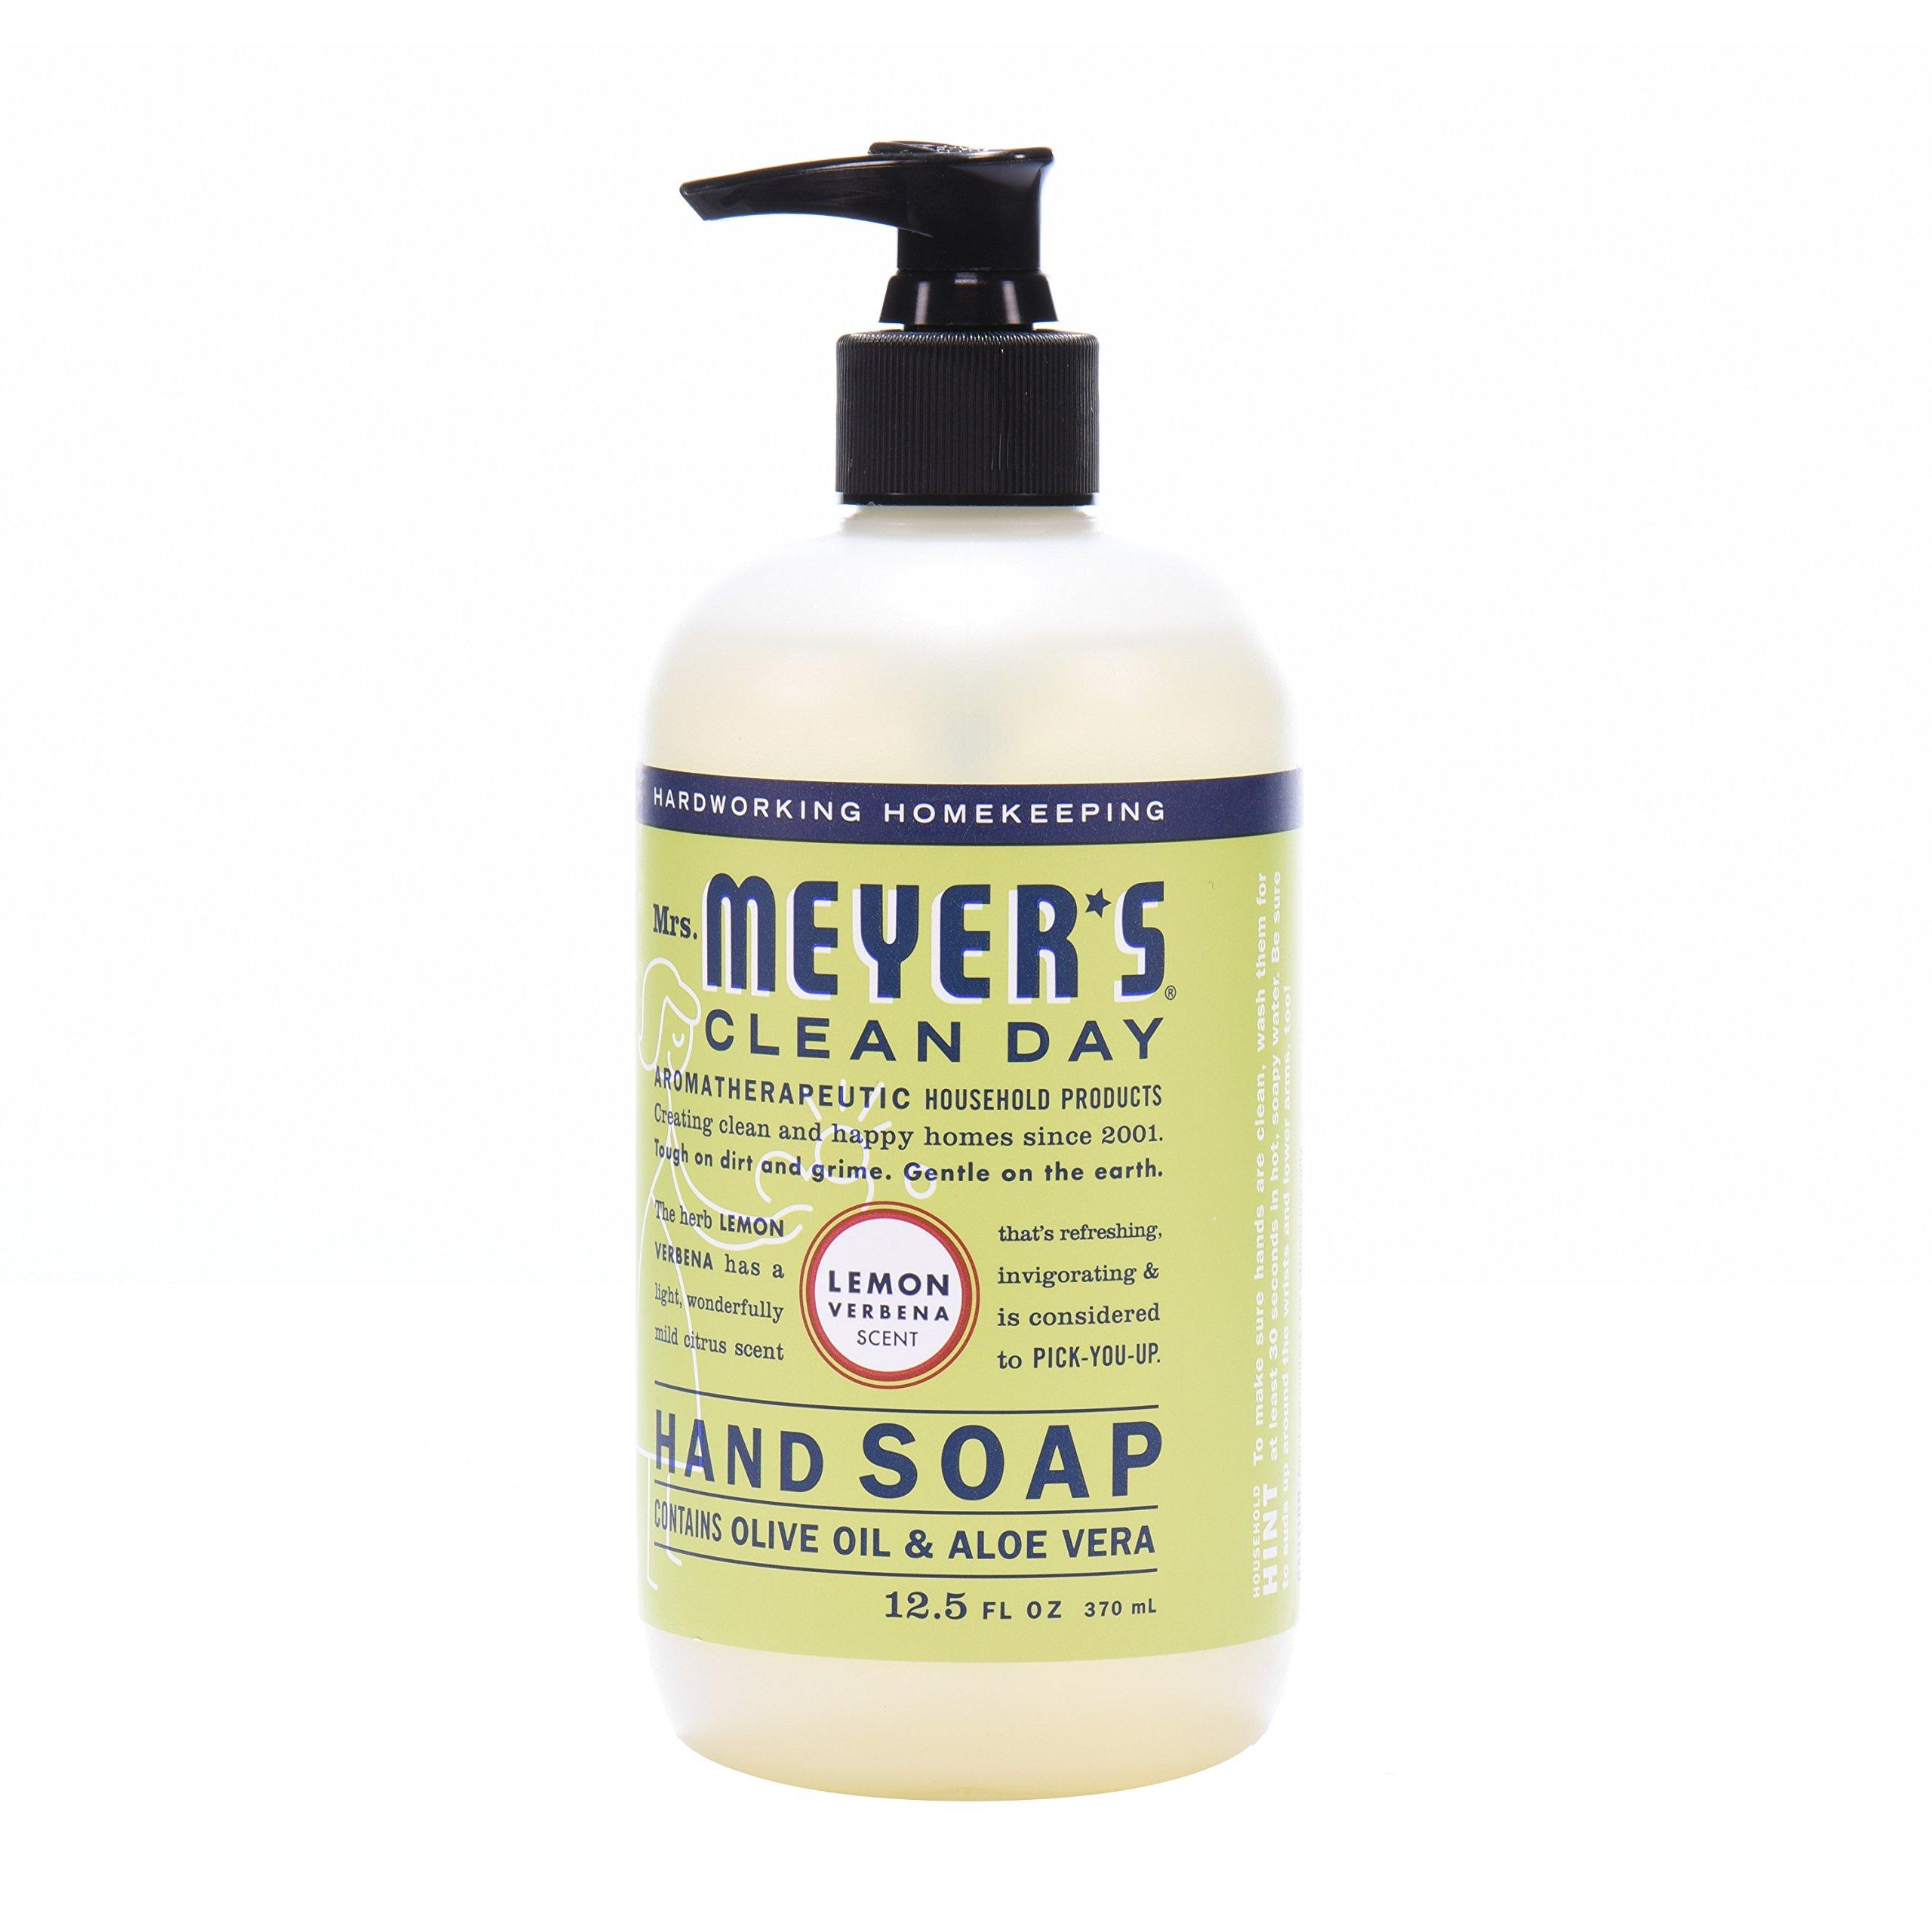 Mrs. Meyer's Clean Day Kitchen Basics Set, Lemon Verbena, 3 ct: Dish Soap (16 fl oz), Hand Soap (12.5 fl oz), Multi-Surface Everyday Cleaner (16 fl oz) by Mrs. Meyer's Clean Day (Image #8)